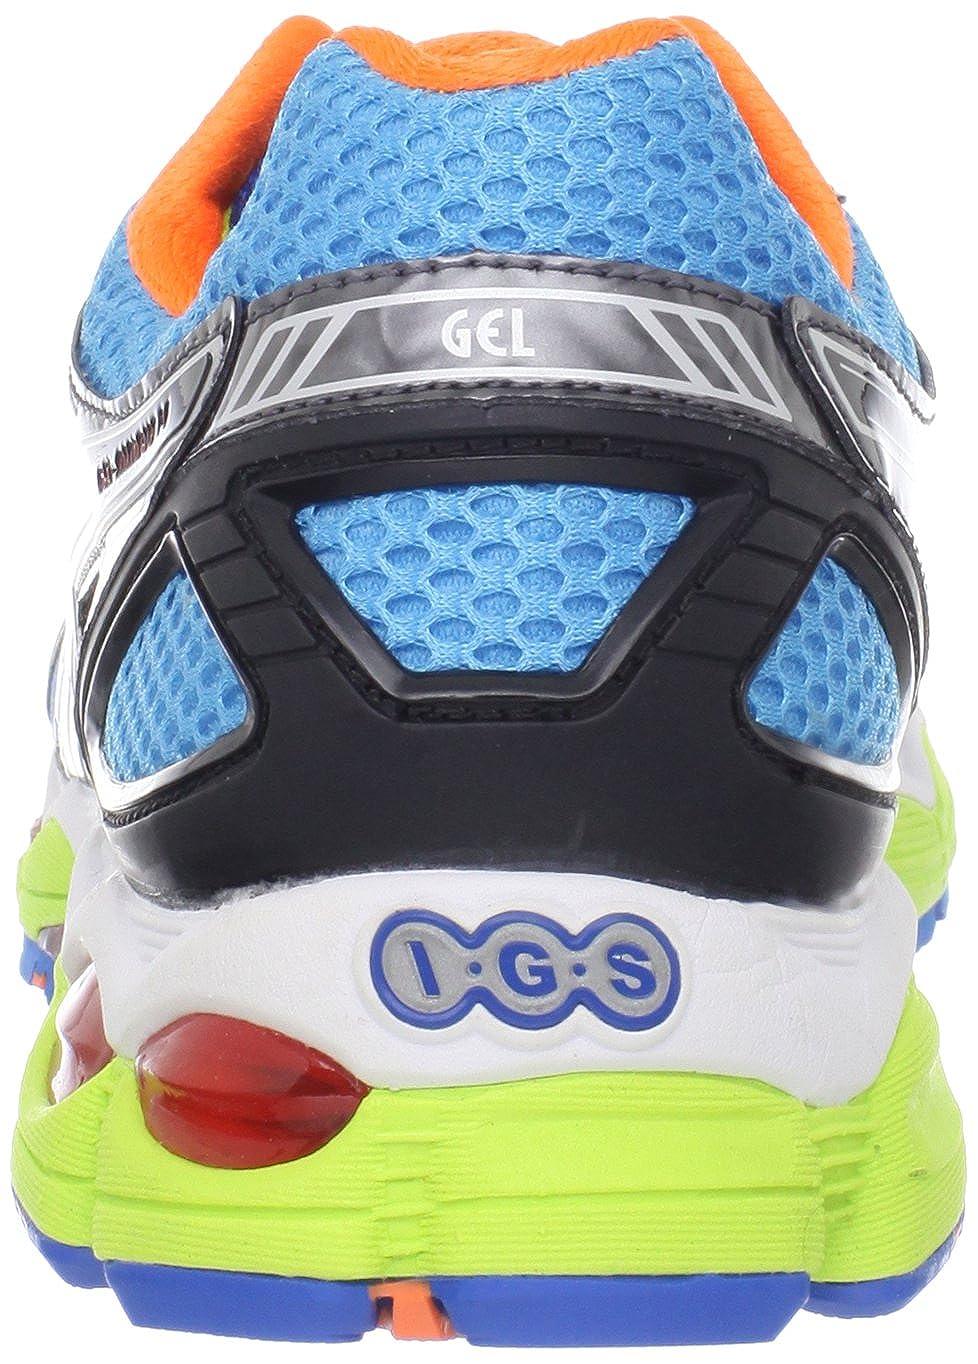 1a14296f63c5 ASICS Gel-NimbUK 14 Men s Sneakers In Lite Bright Black (T241N-6990)   Amazon.co.uk  Shoes   Bags